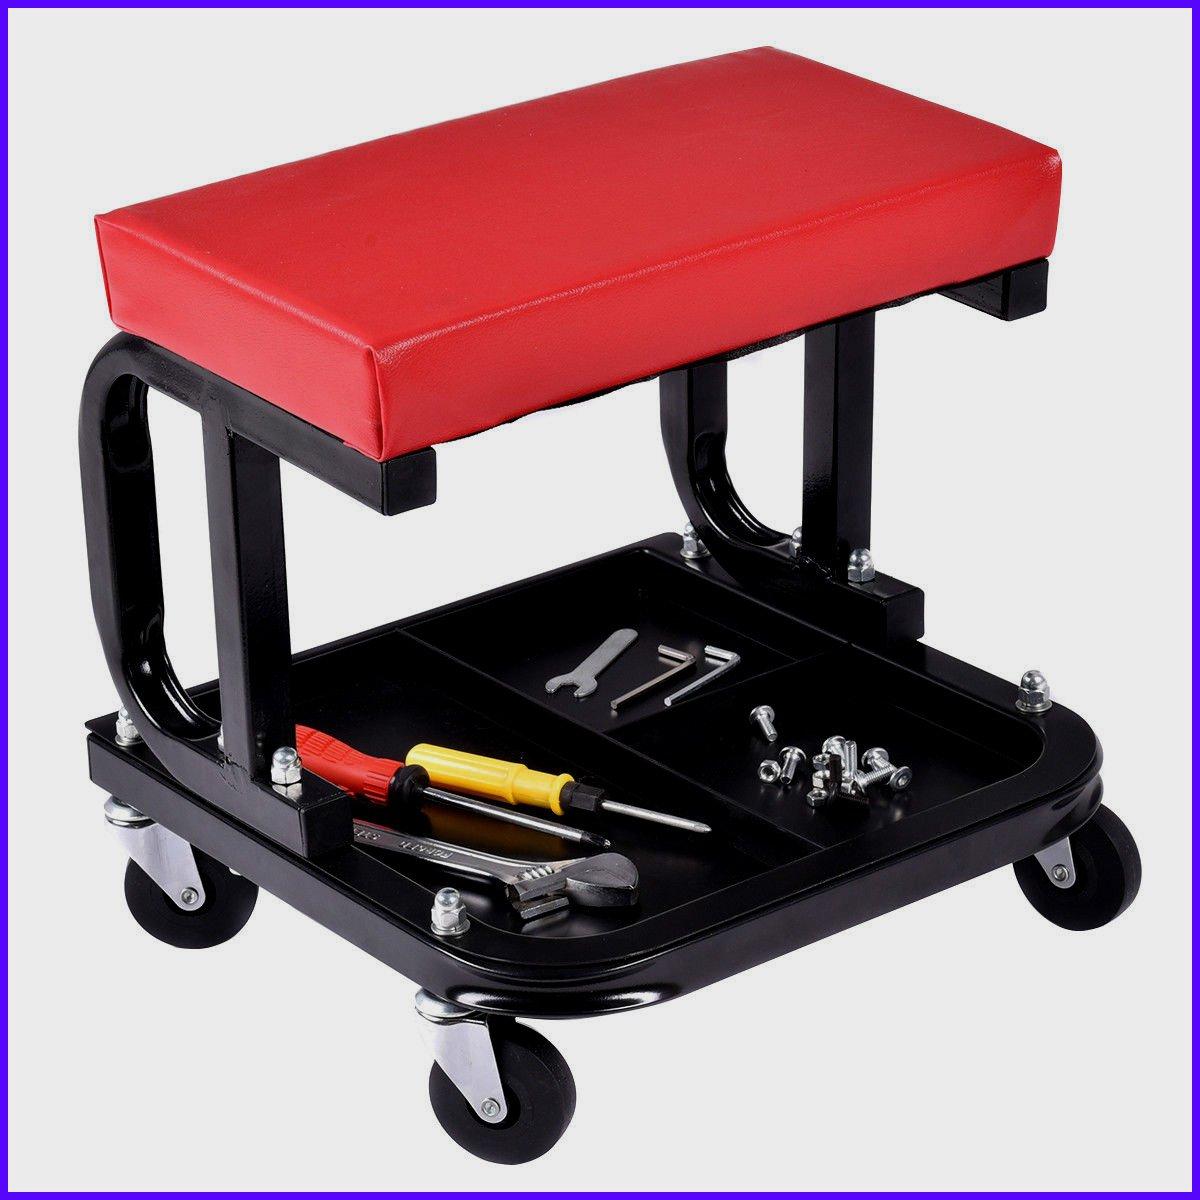 Mechanics Roller Seats Rolling Creeper Seat Mechanic Automotive Accessory Stool Chair Repair Tools Tray Shop Auto Car Garage - House Deals